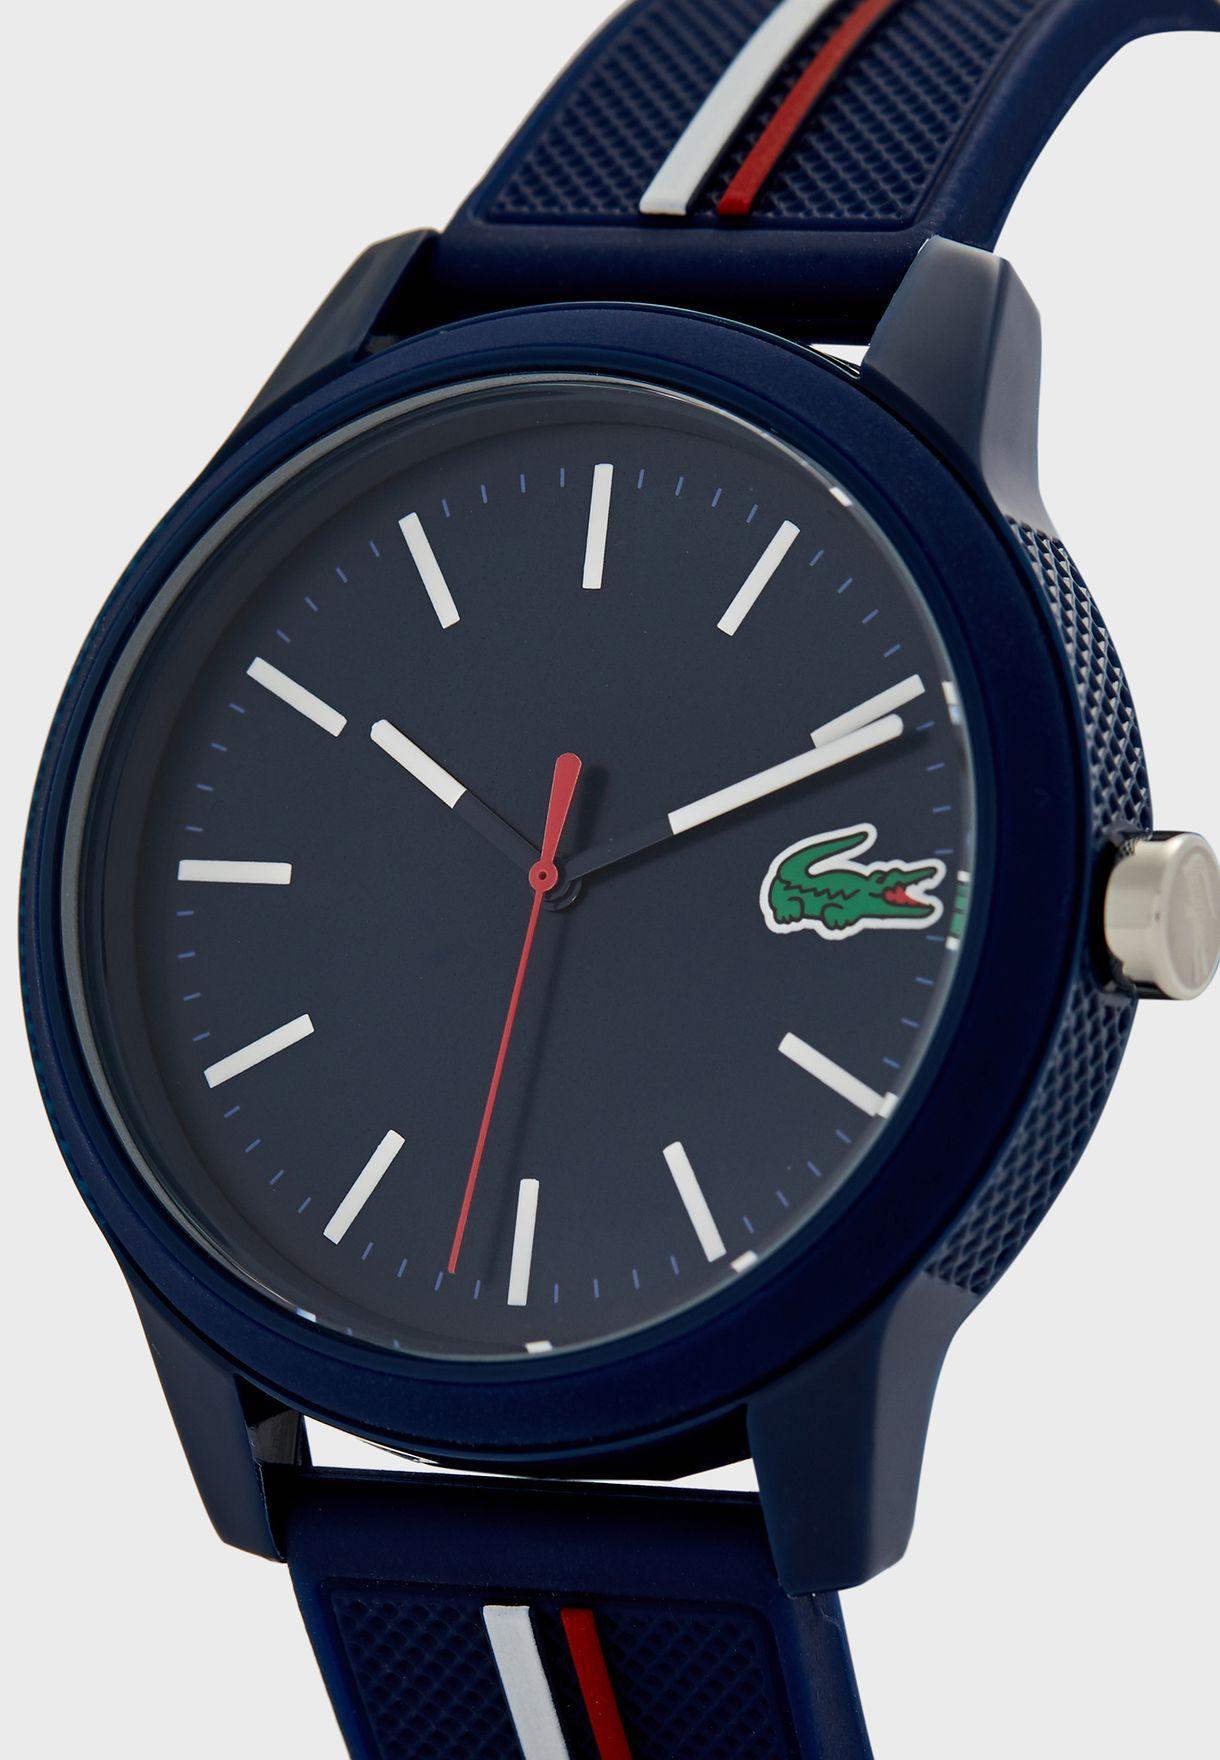 2011070 Analog Watch